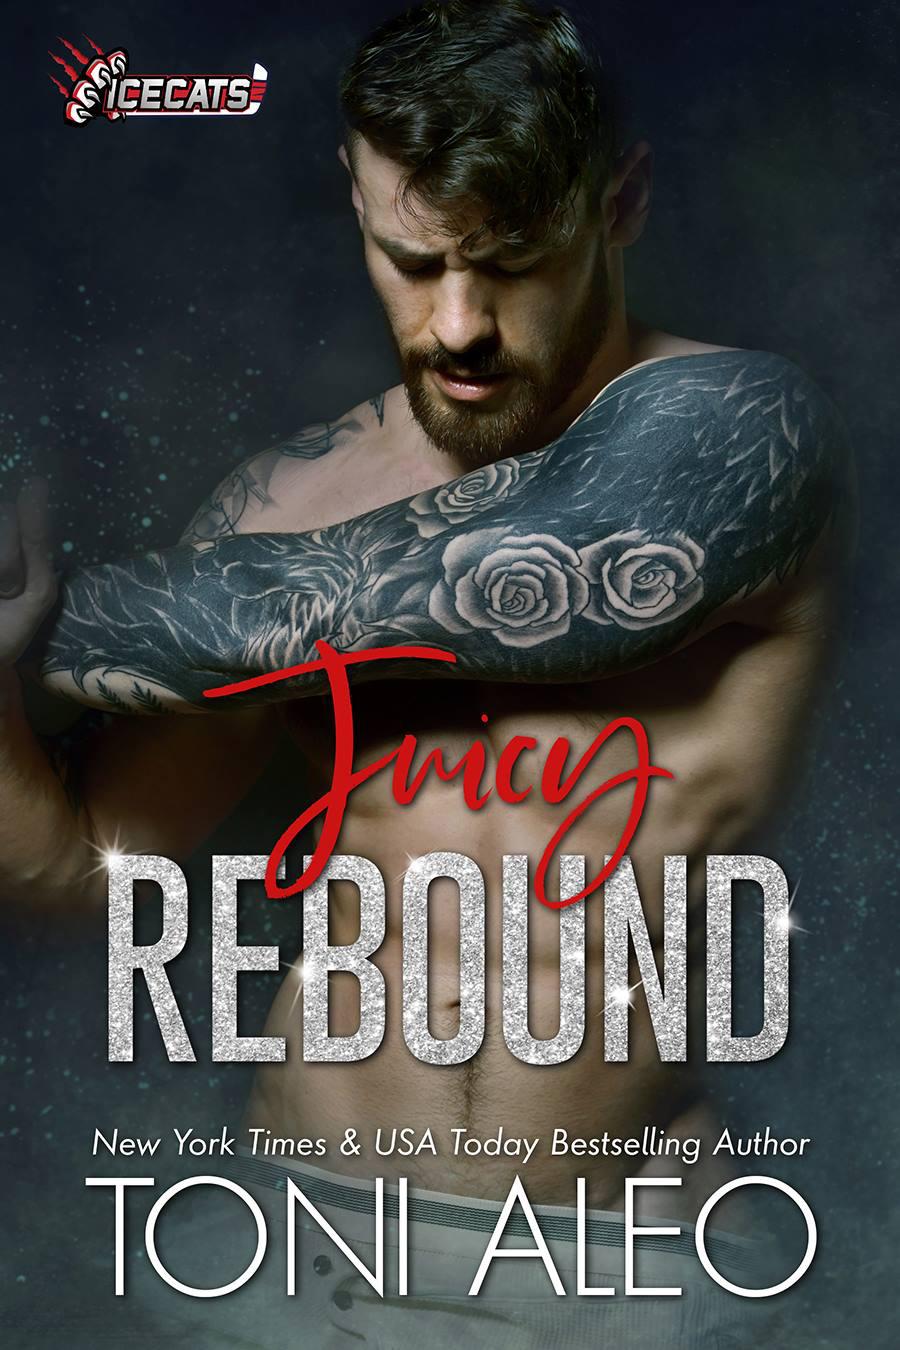 JUICY REBOUND